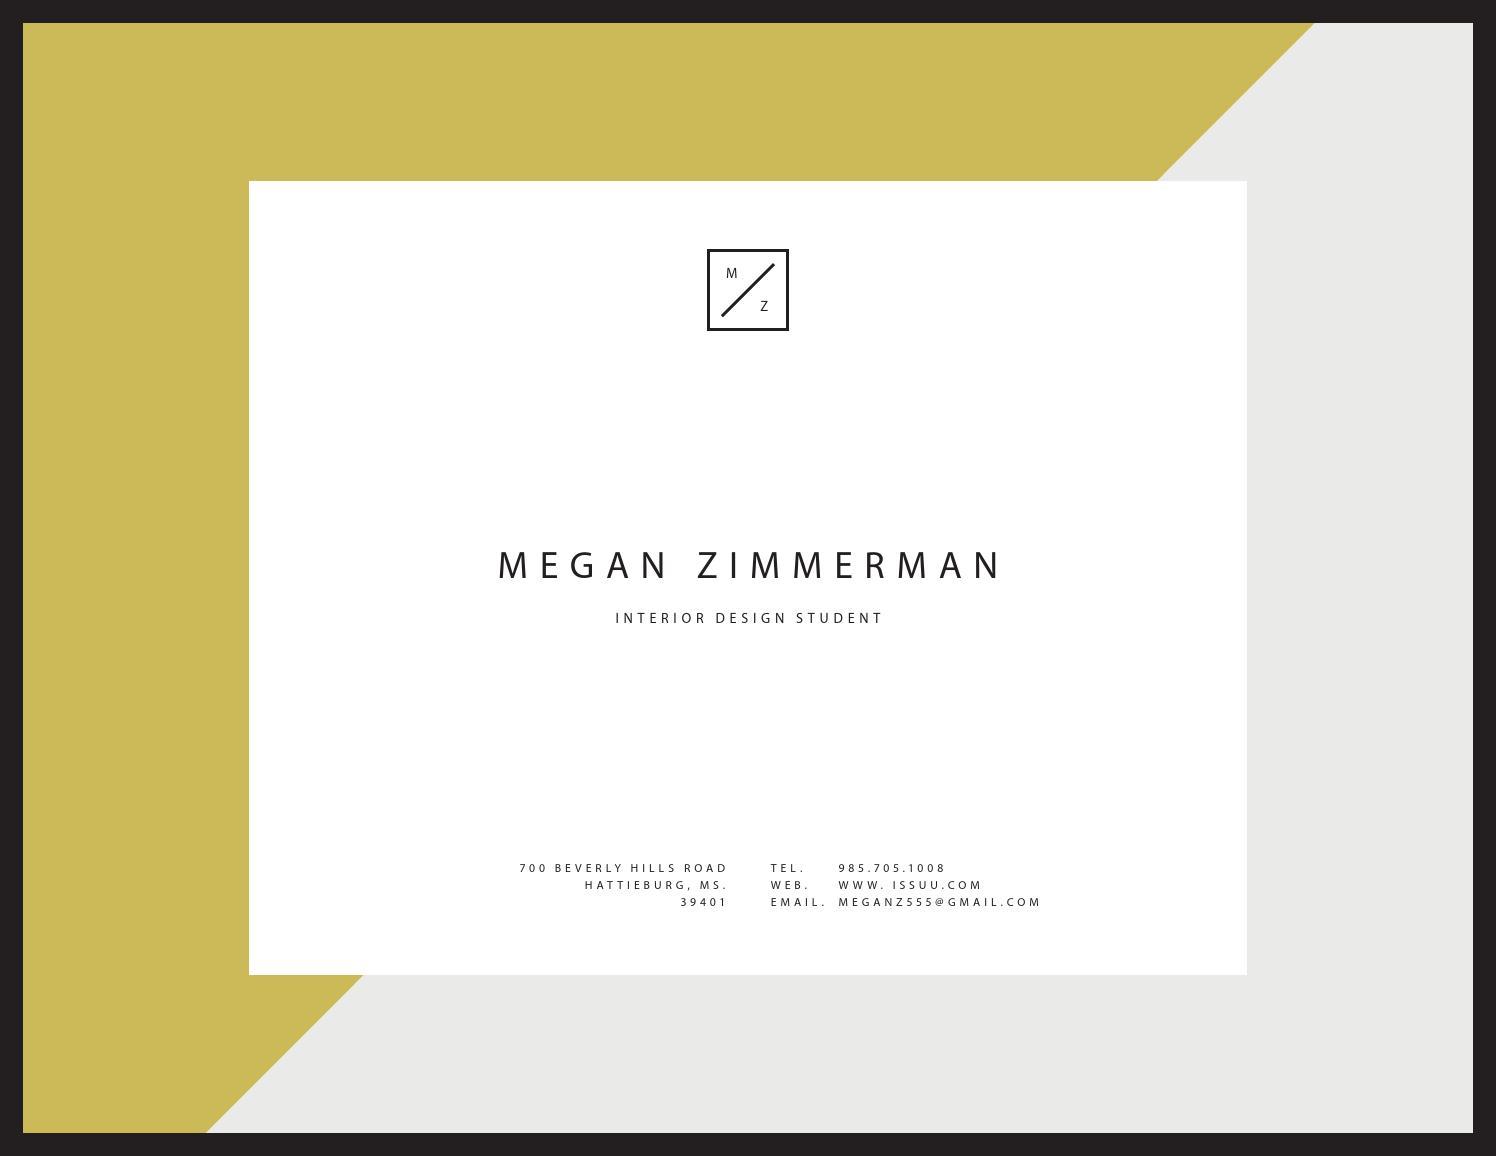 Megan's design portfolio by meganz - issuu